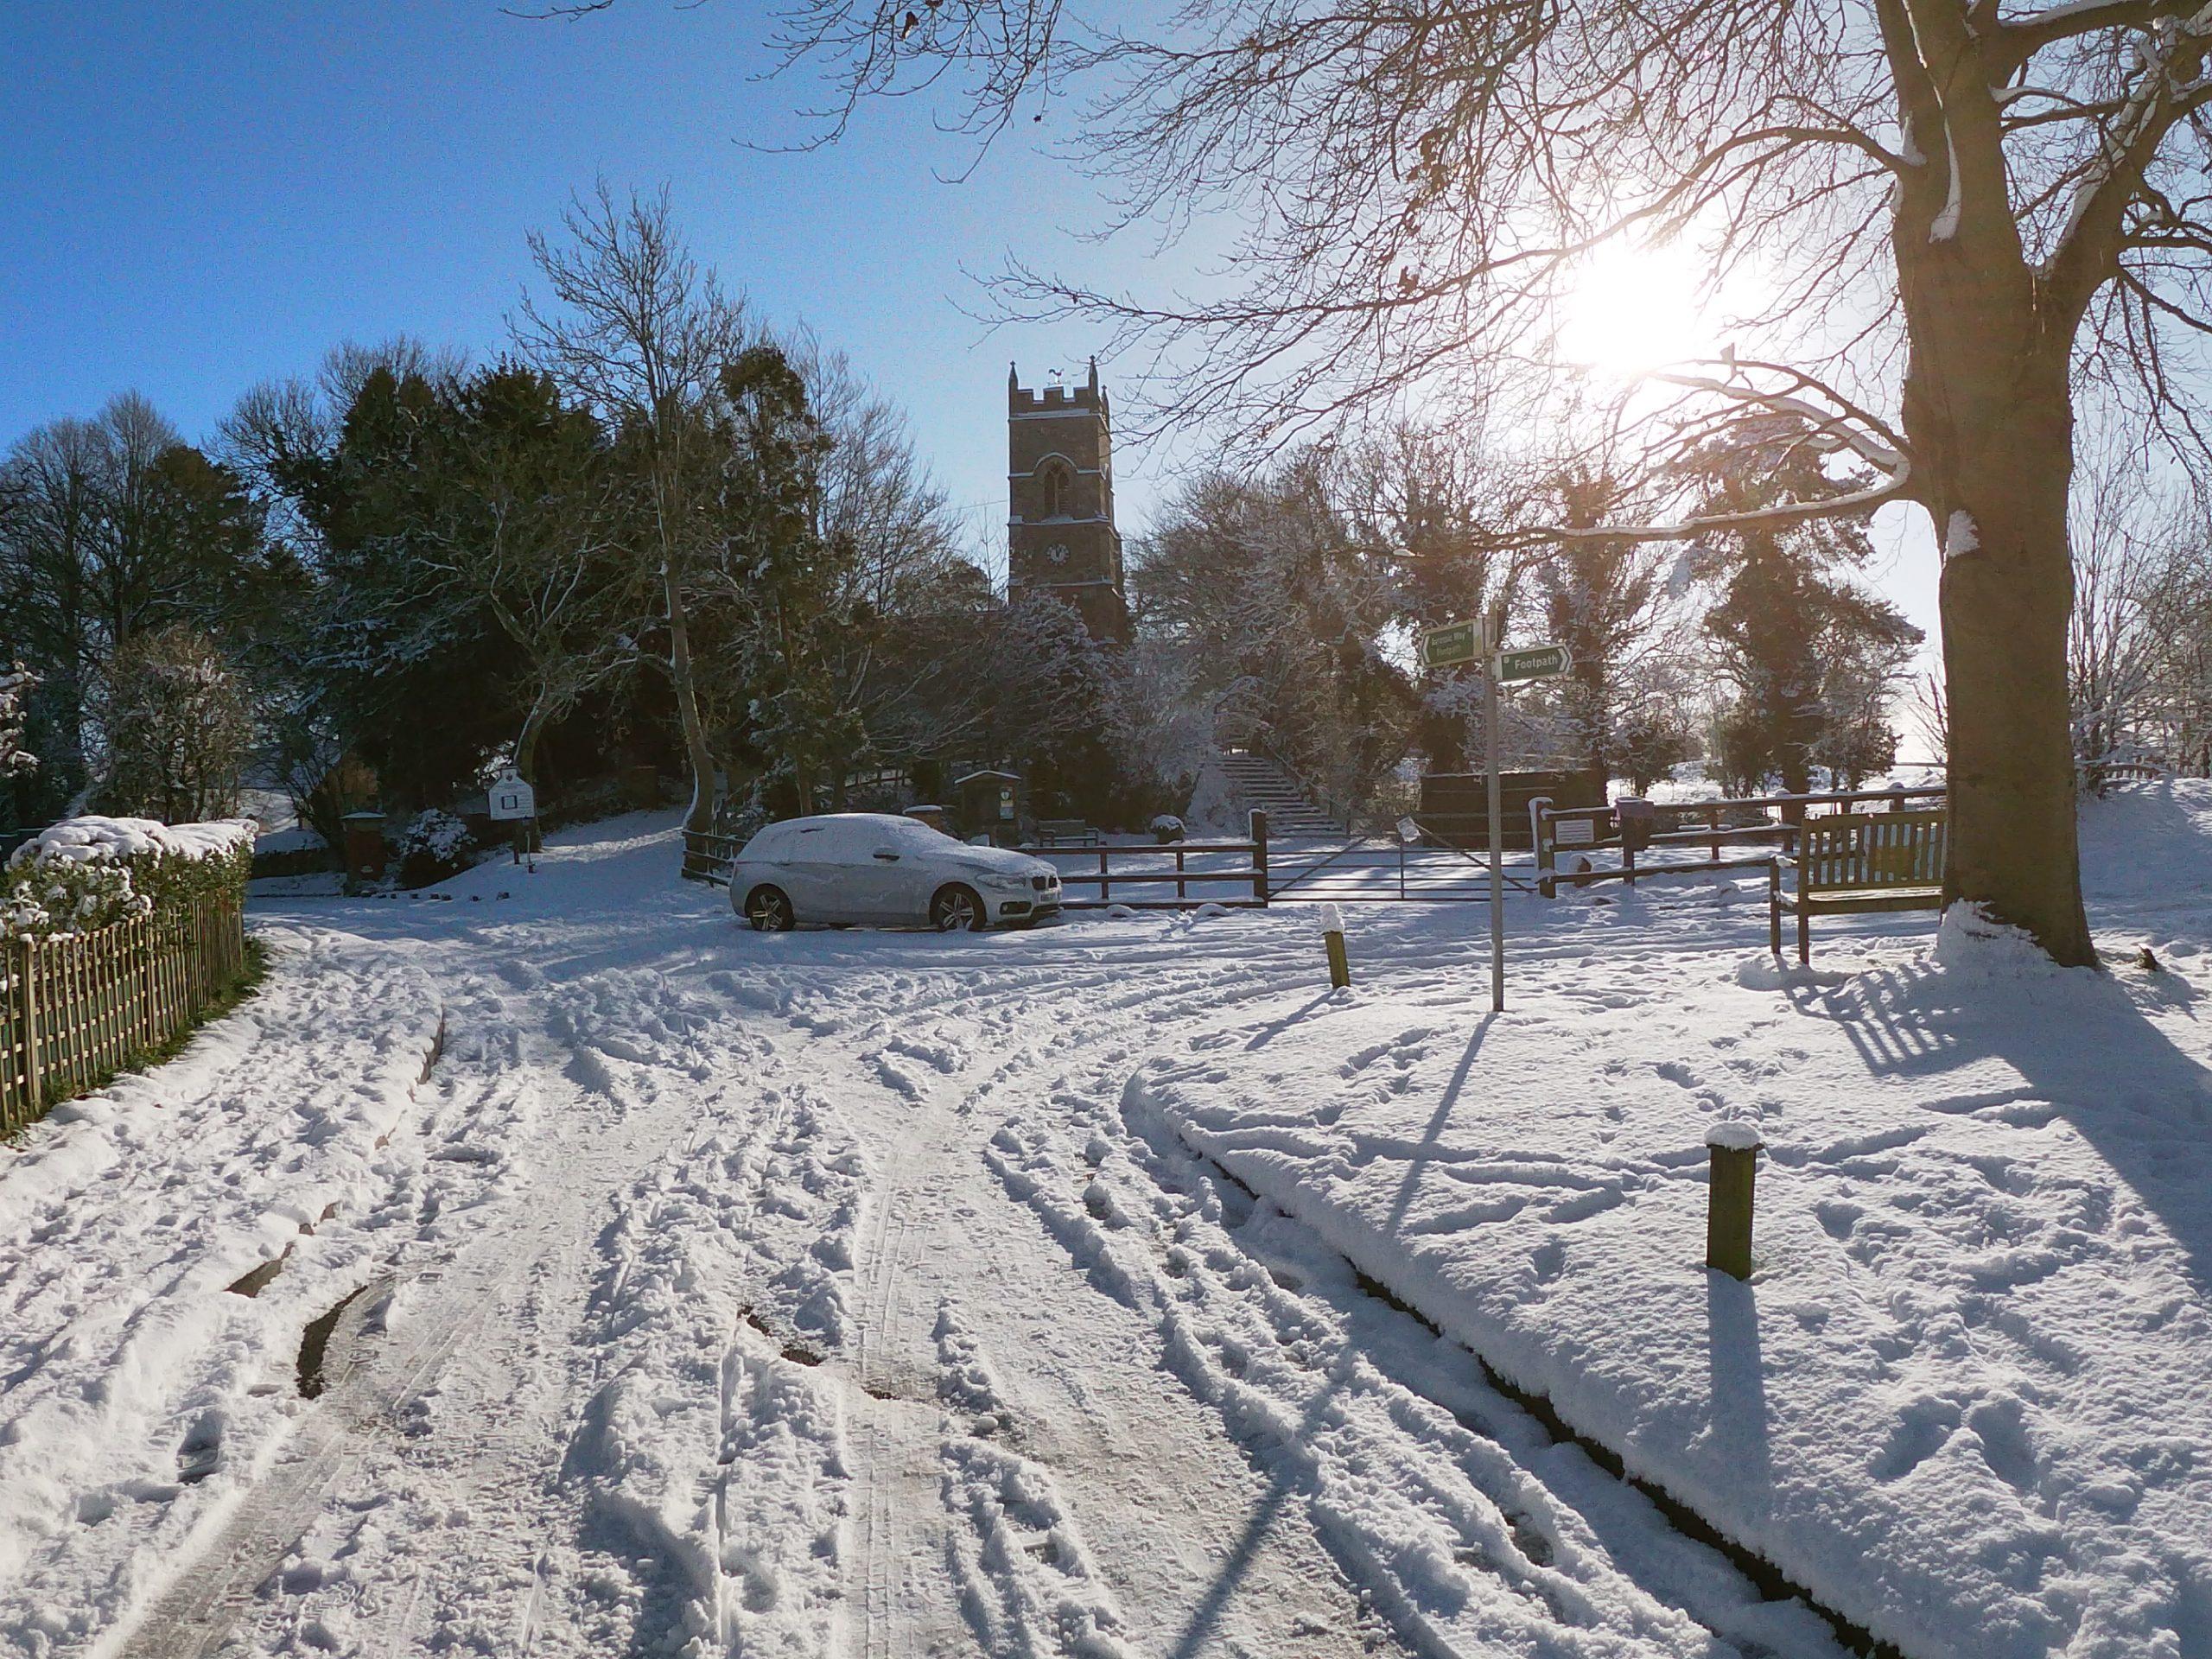 Church in the Snow - Jan 2021